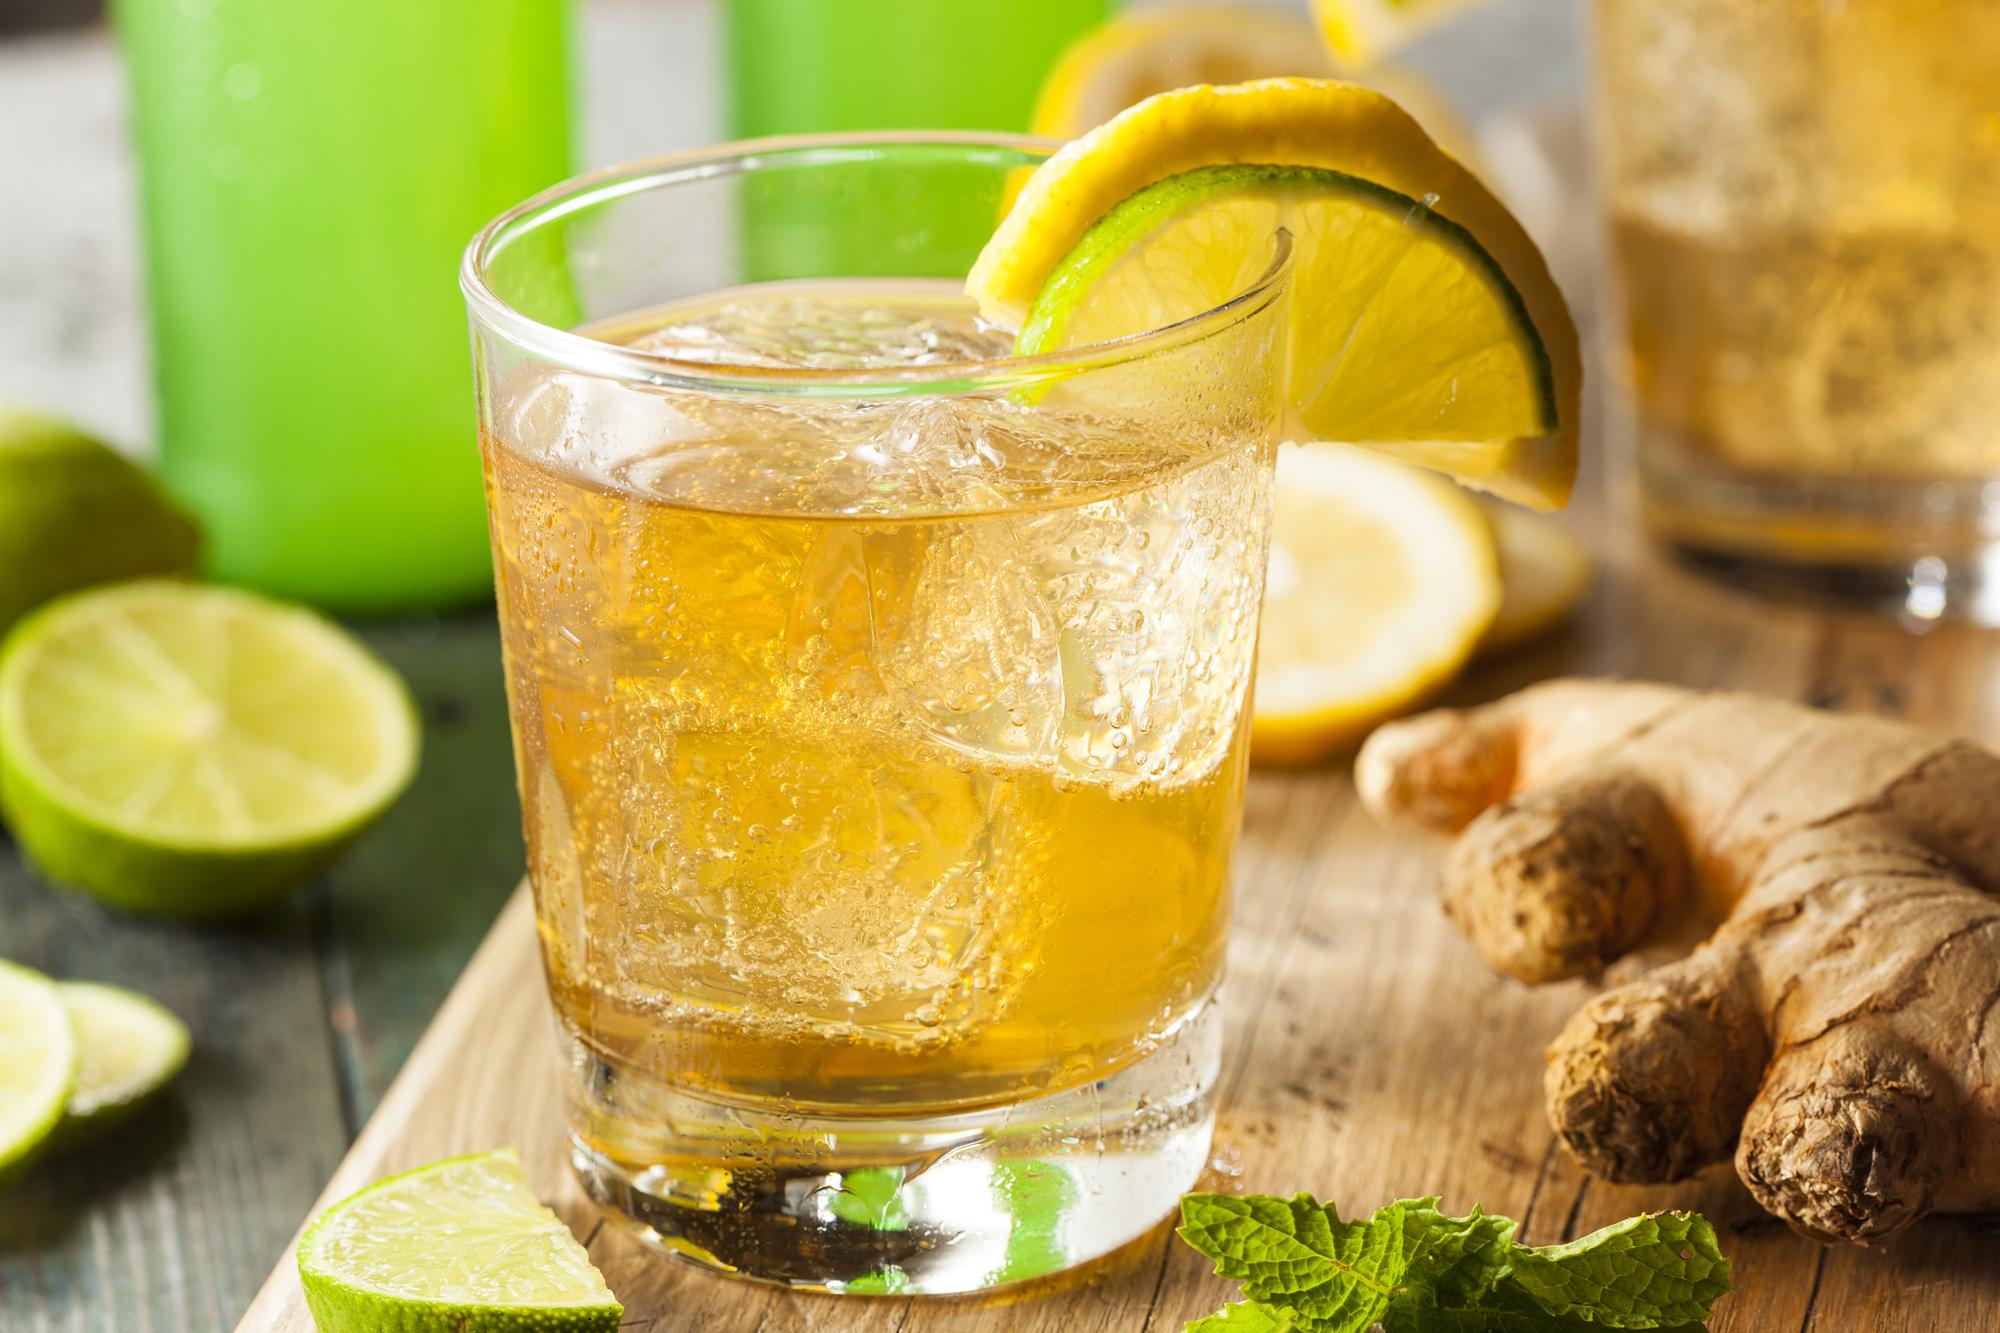 Zázvorová limonáda recept